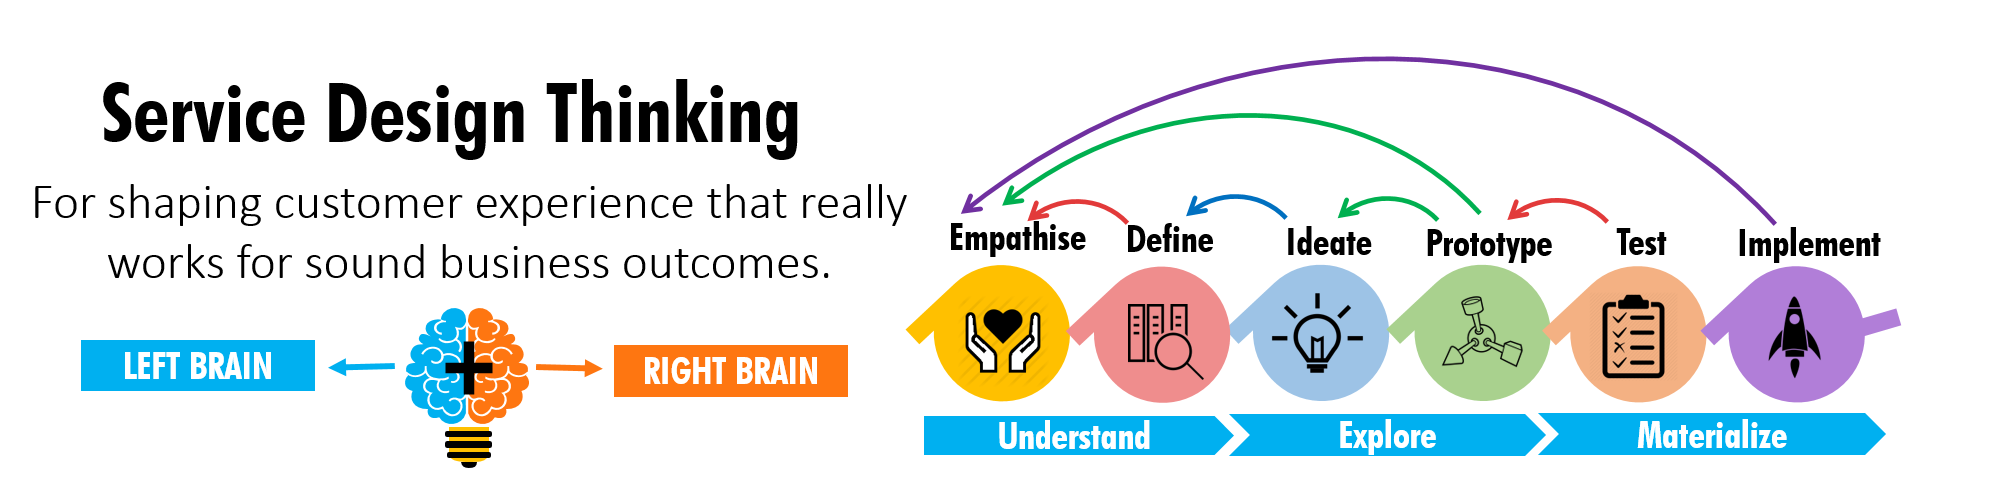 service Design Thinking, Design thinking